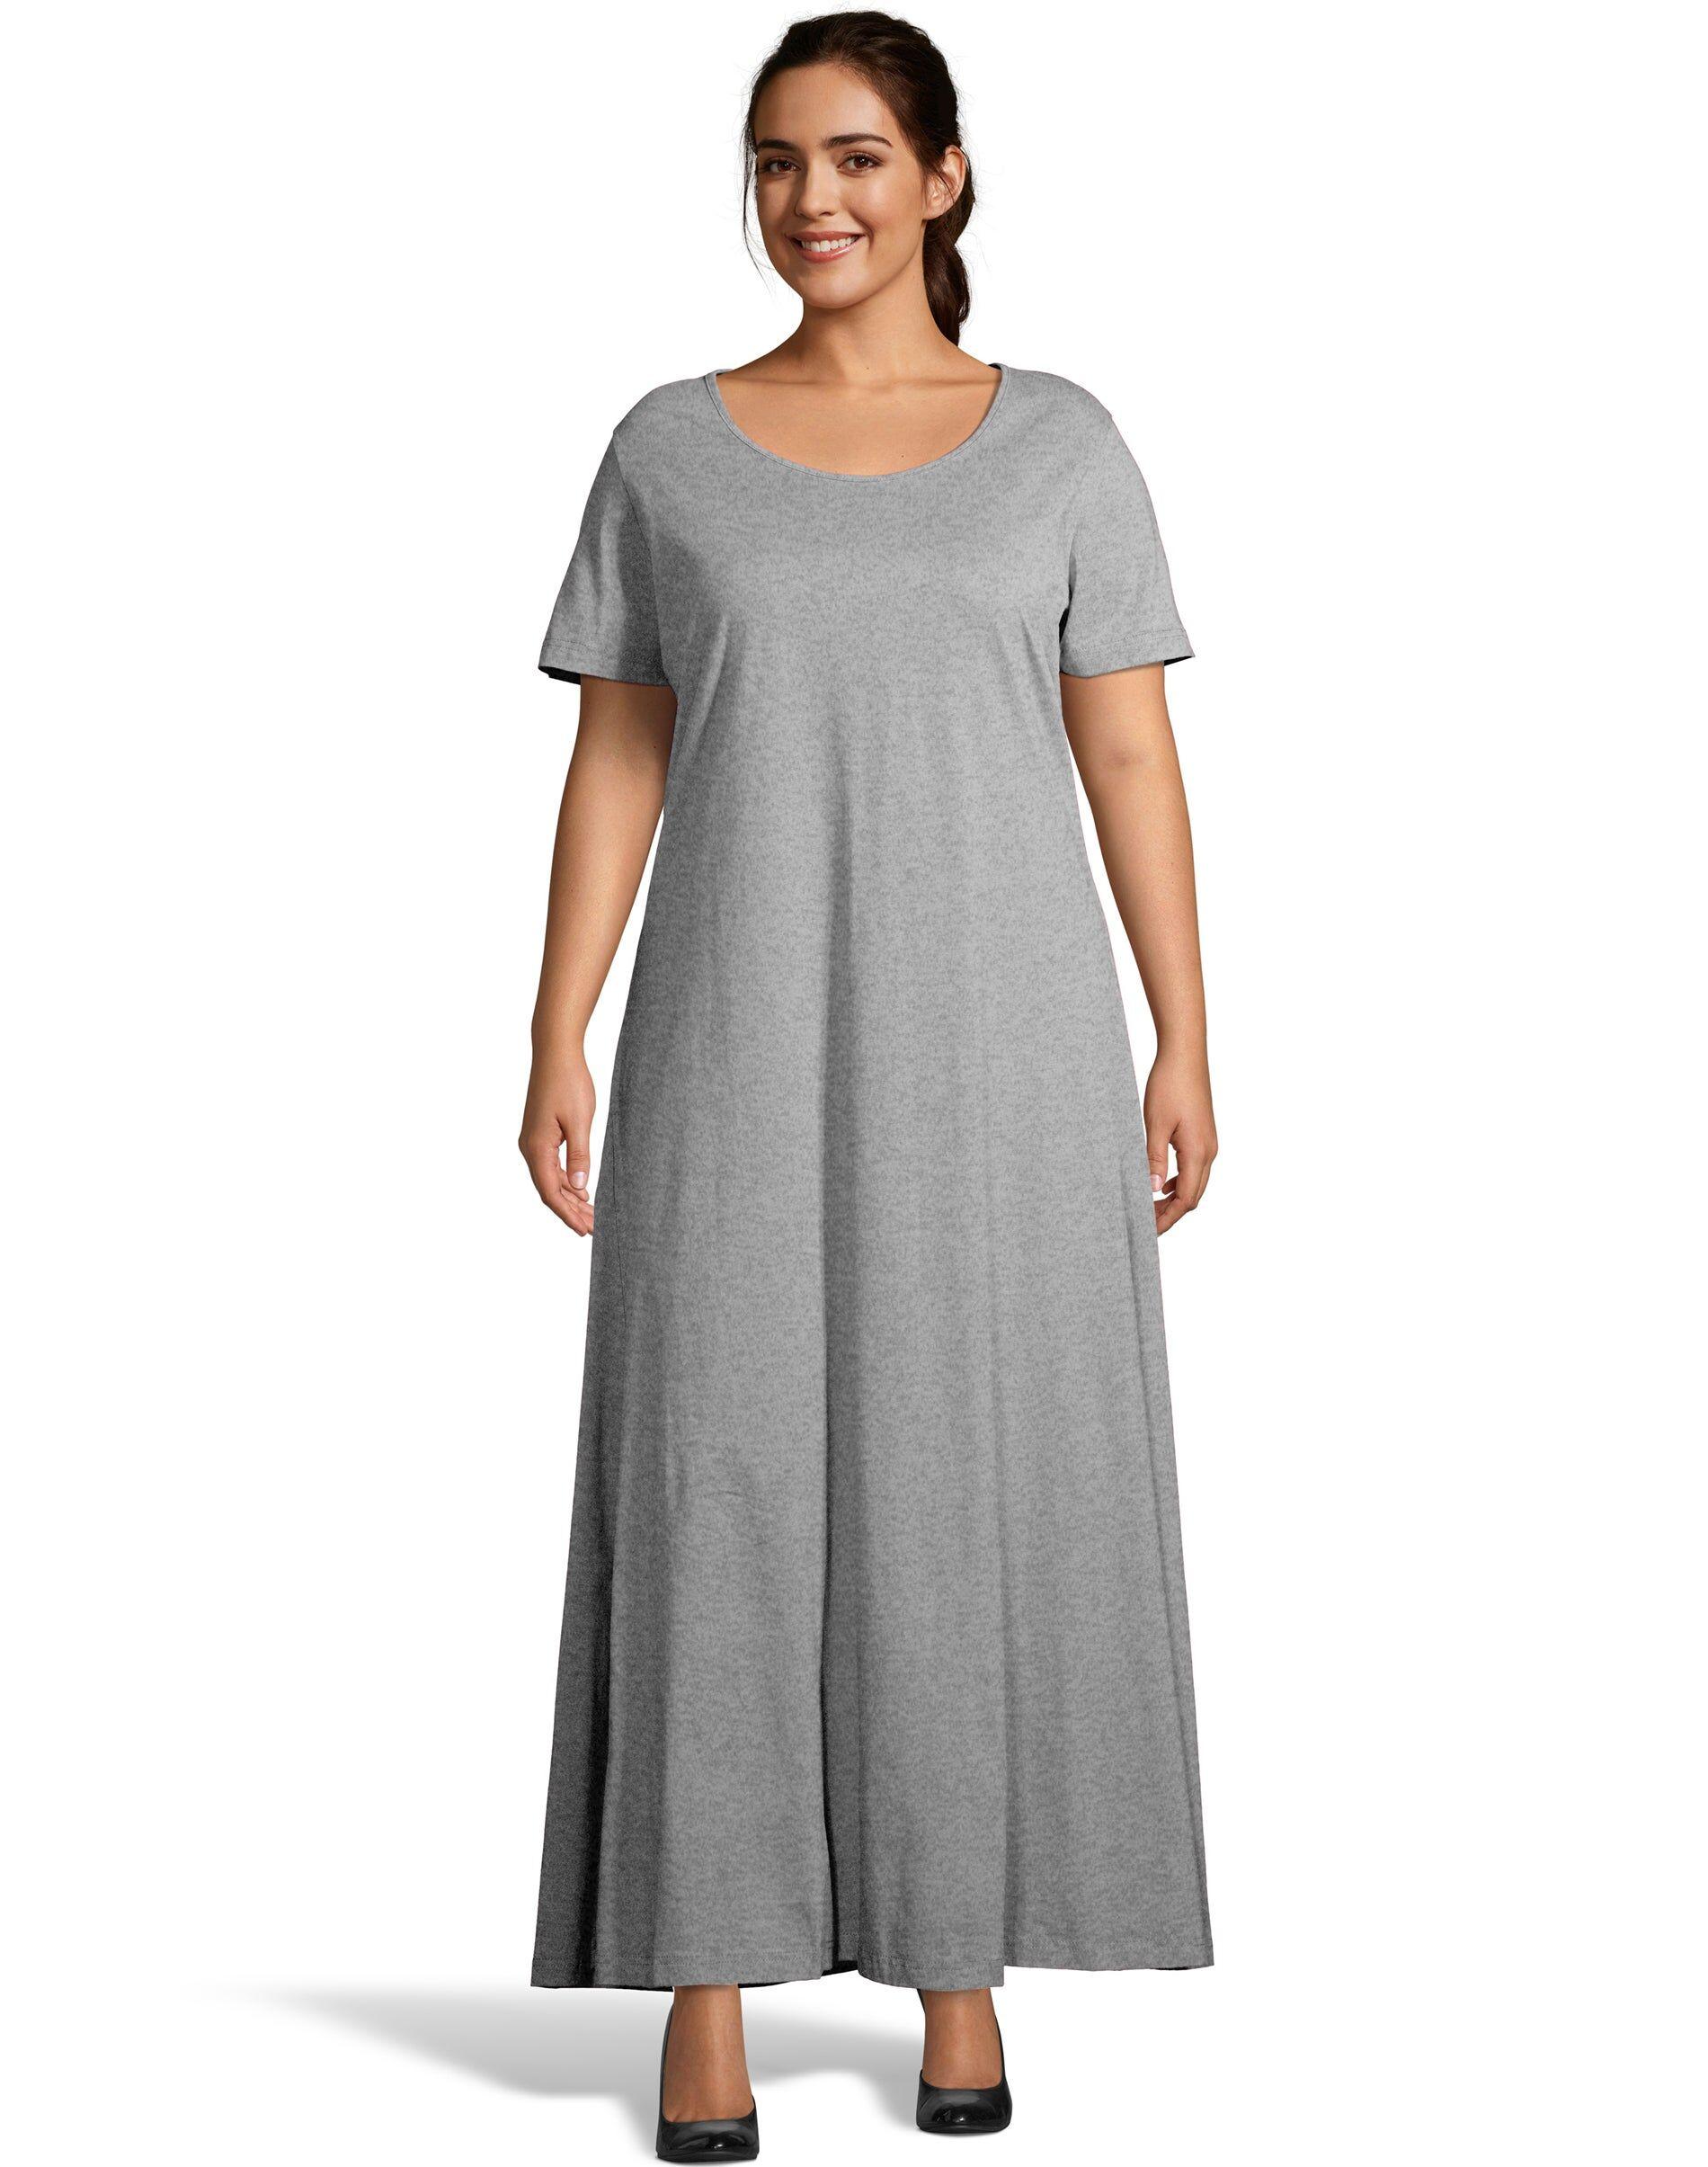 Just My Size Jersey Matchables Maxi Dress Grey Heather 4X Women's